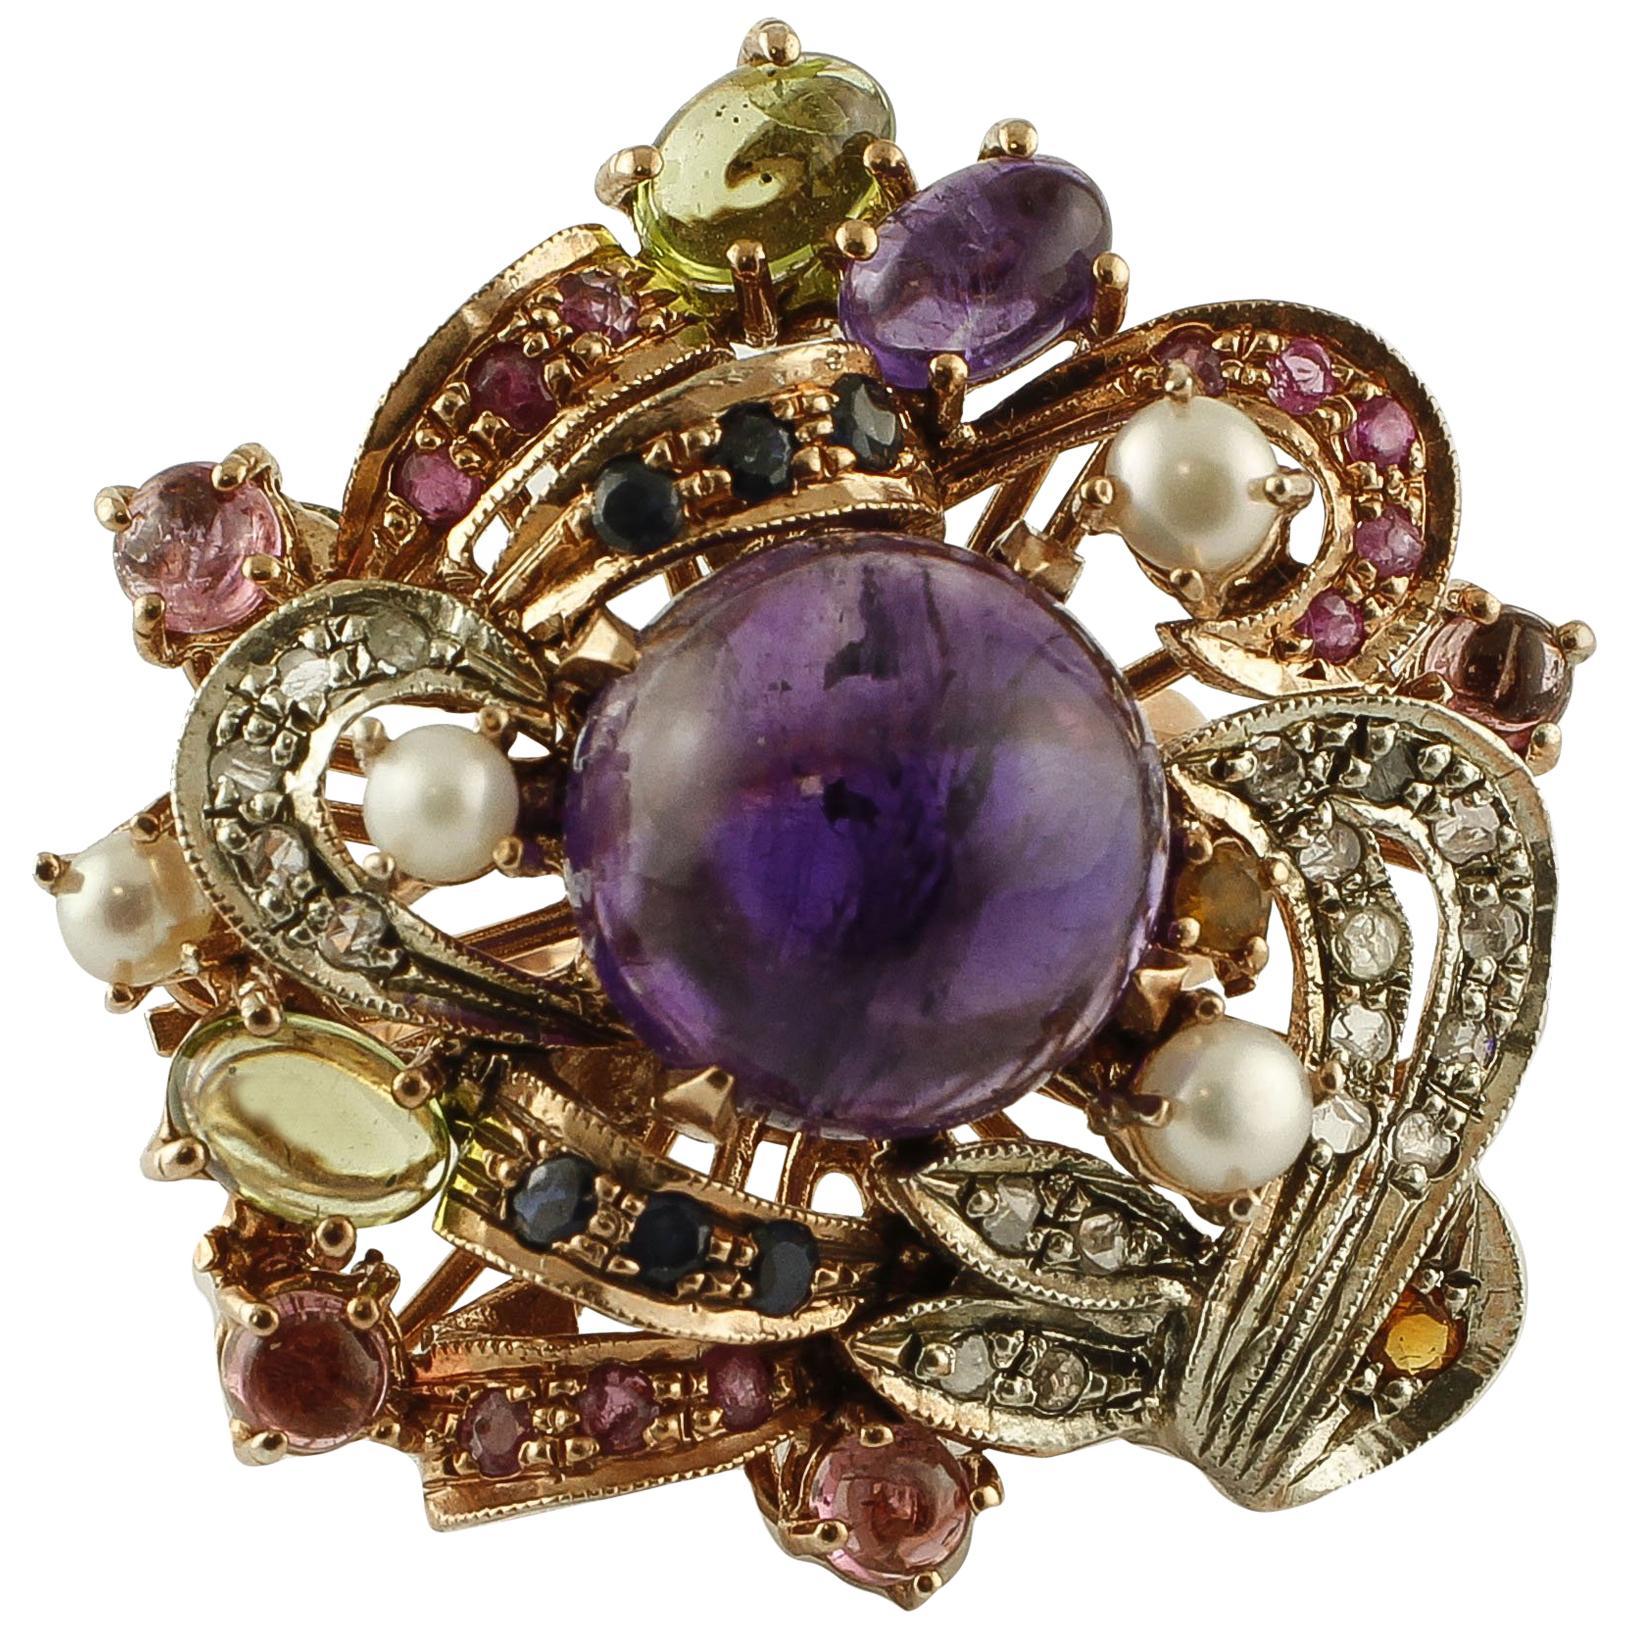 Amethysts,Diamonds,Rubies,Sapphires,Peridot,Garnets,Pearls,Rose Gold&Silver Ring